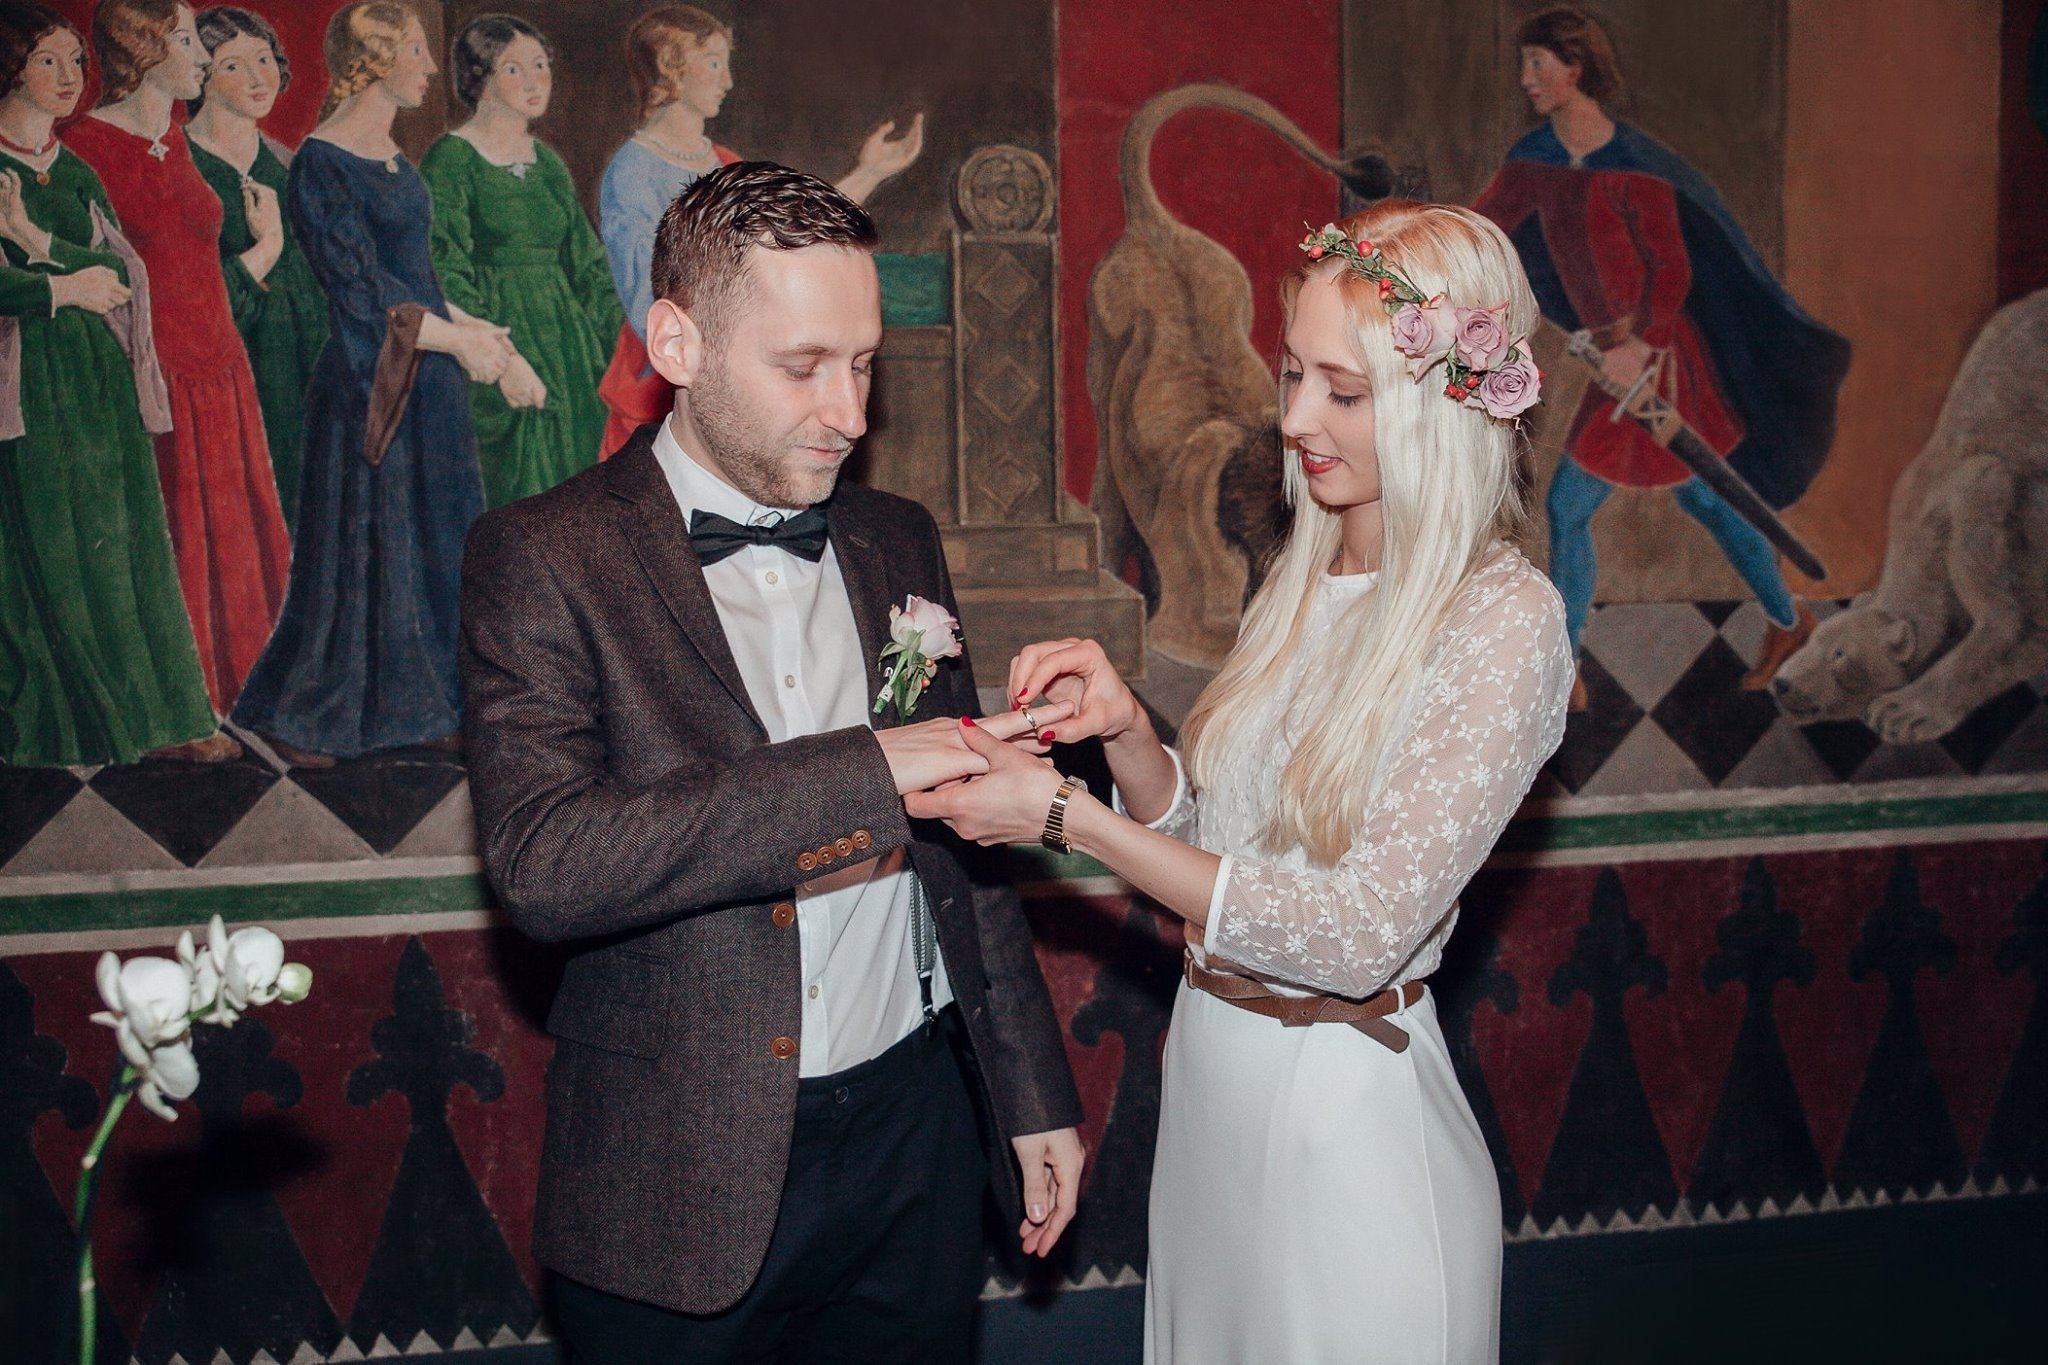 #Enlight #wedding #dress #bride #groom #church #beautiful day #bruden  #brudgom #bryllup #copenhagen #denmark #iphoto #inspire #inspired  #international